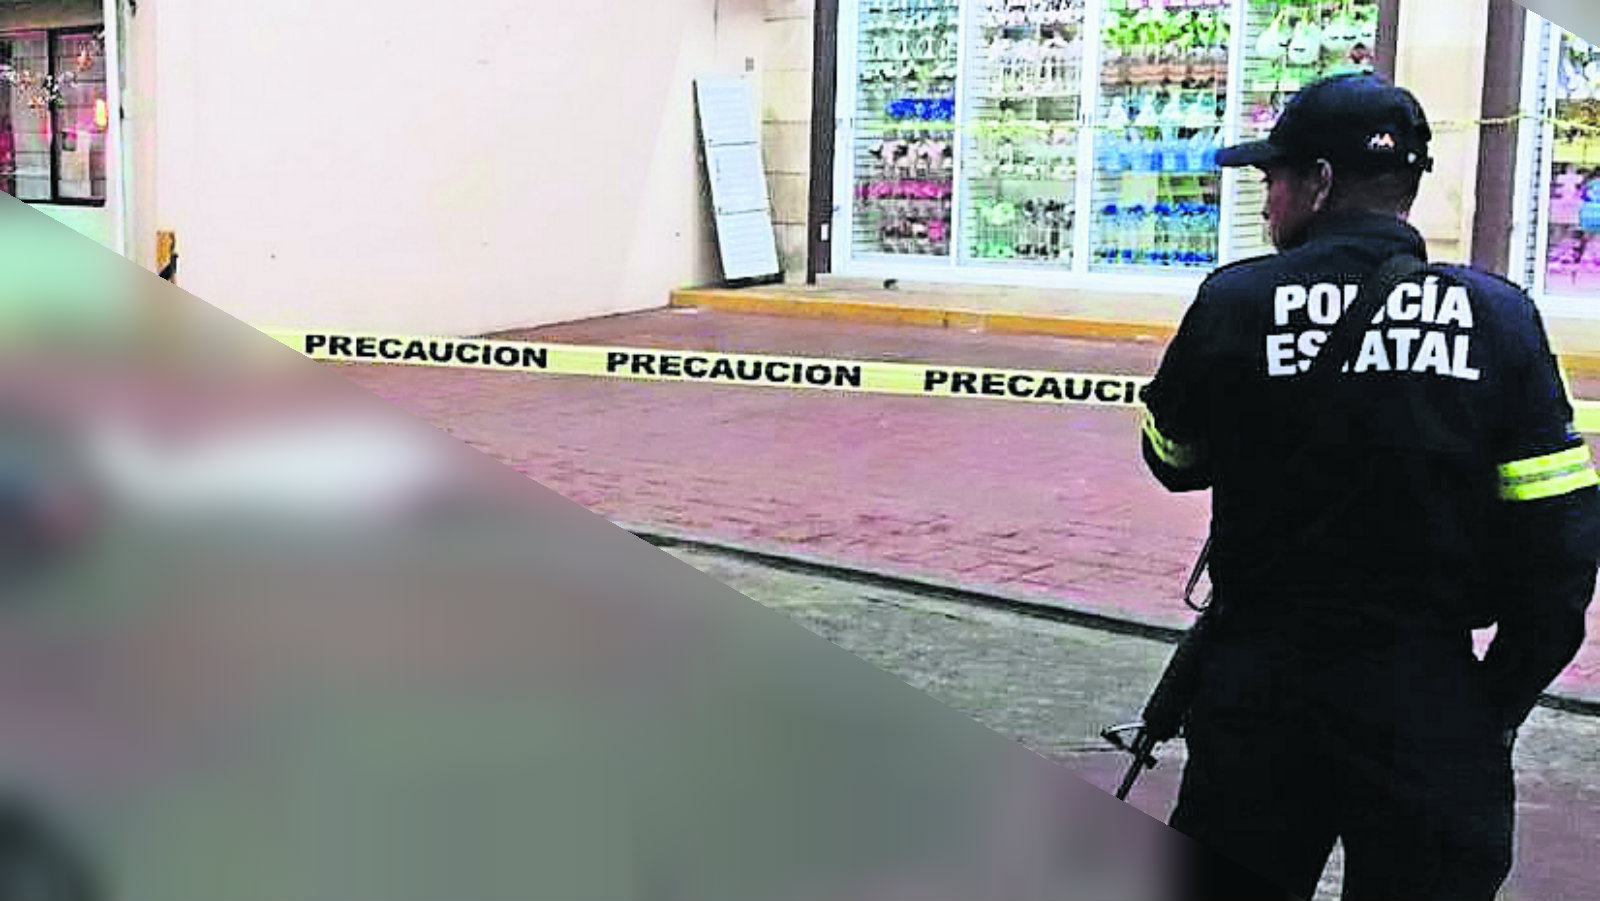 Ladrón Sucidio cárcel Acorralan Toluca